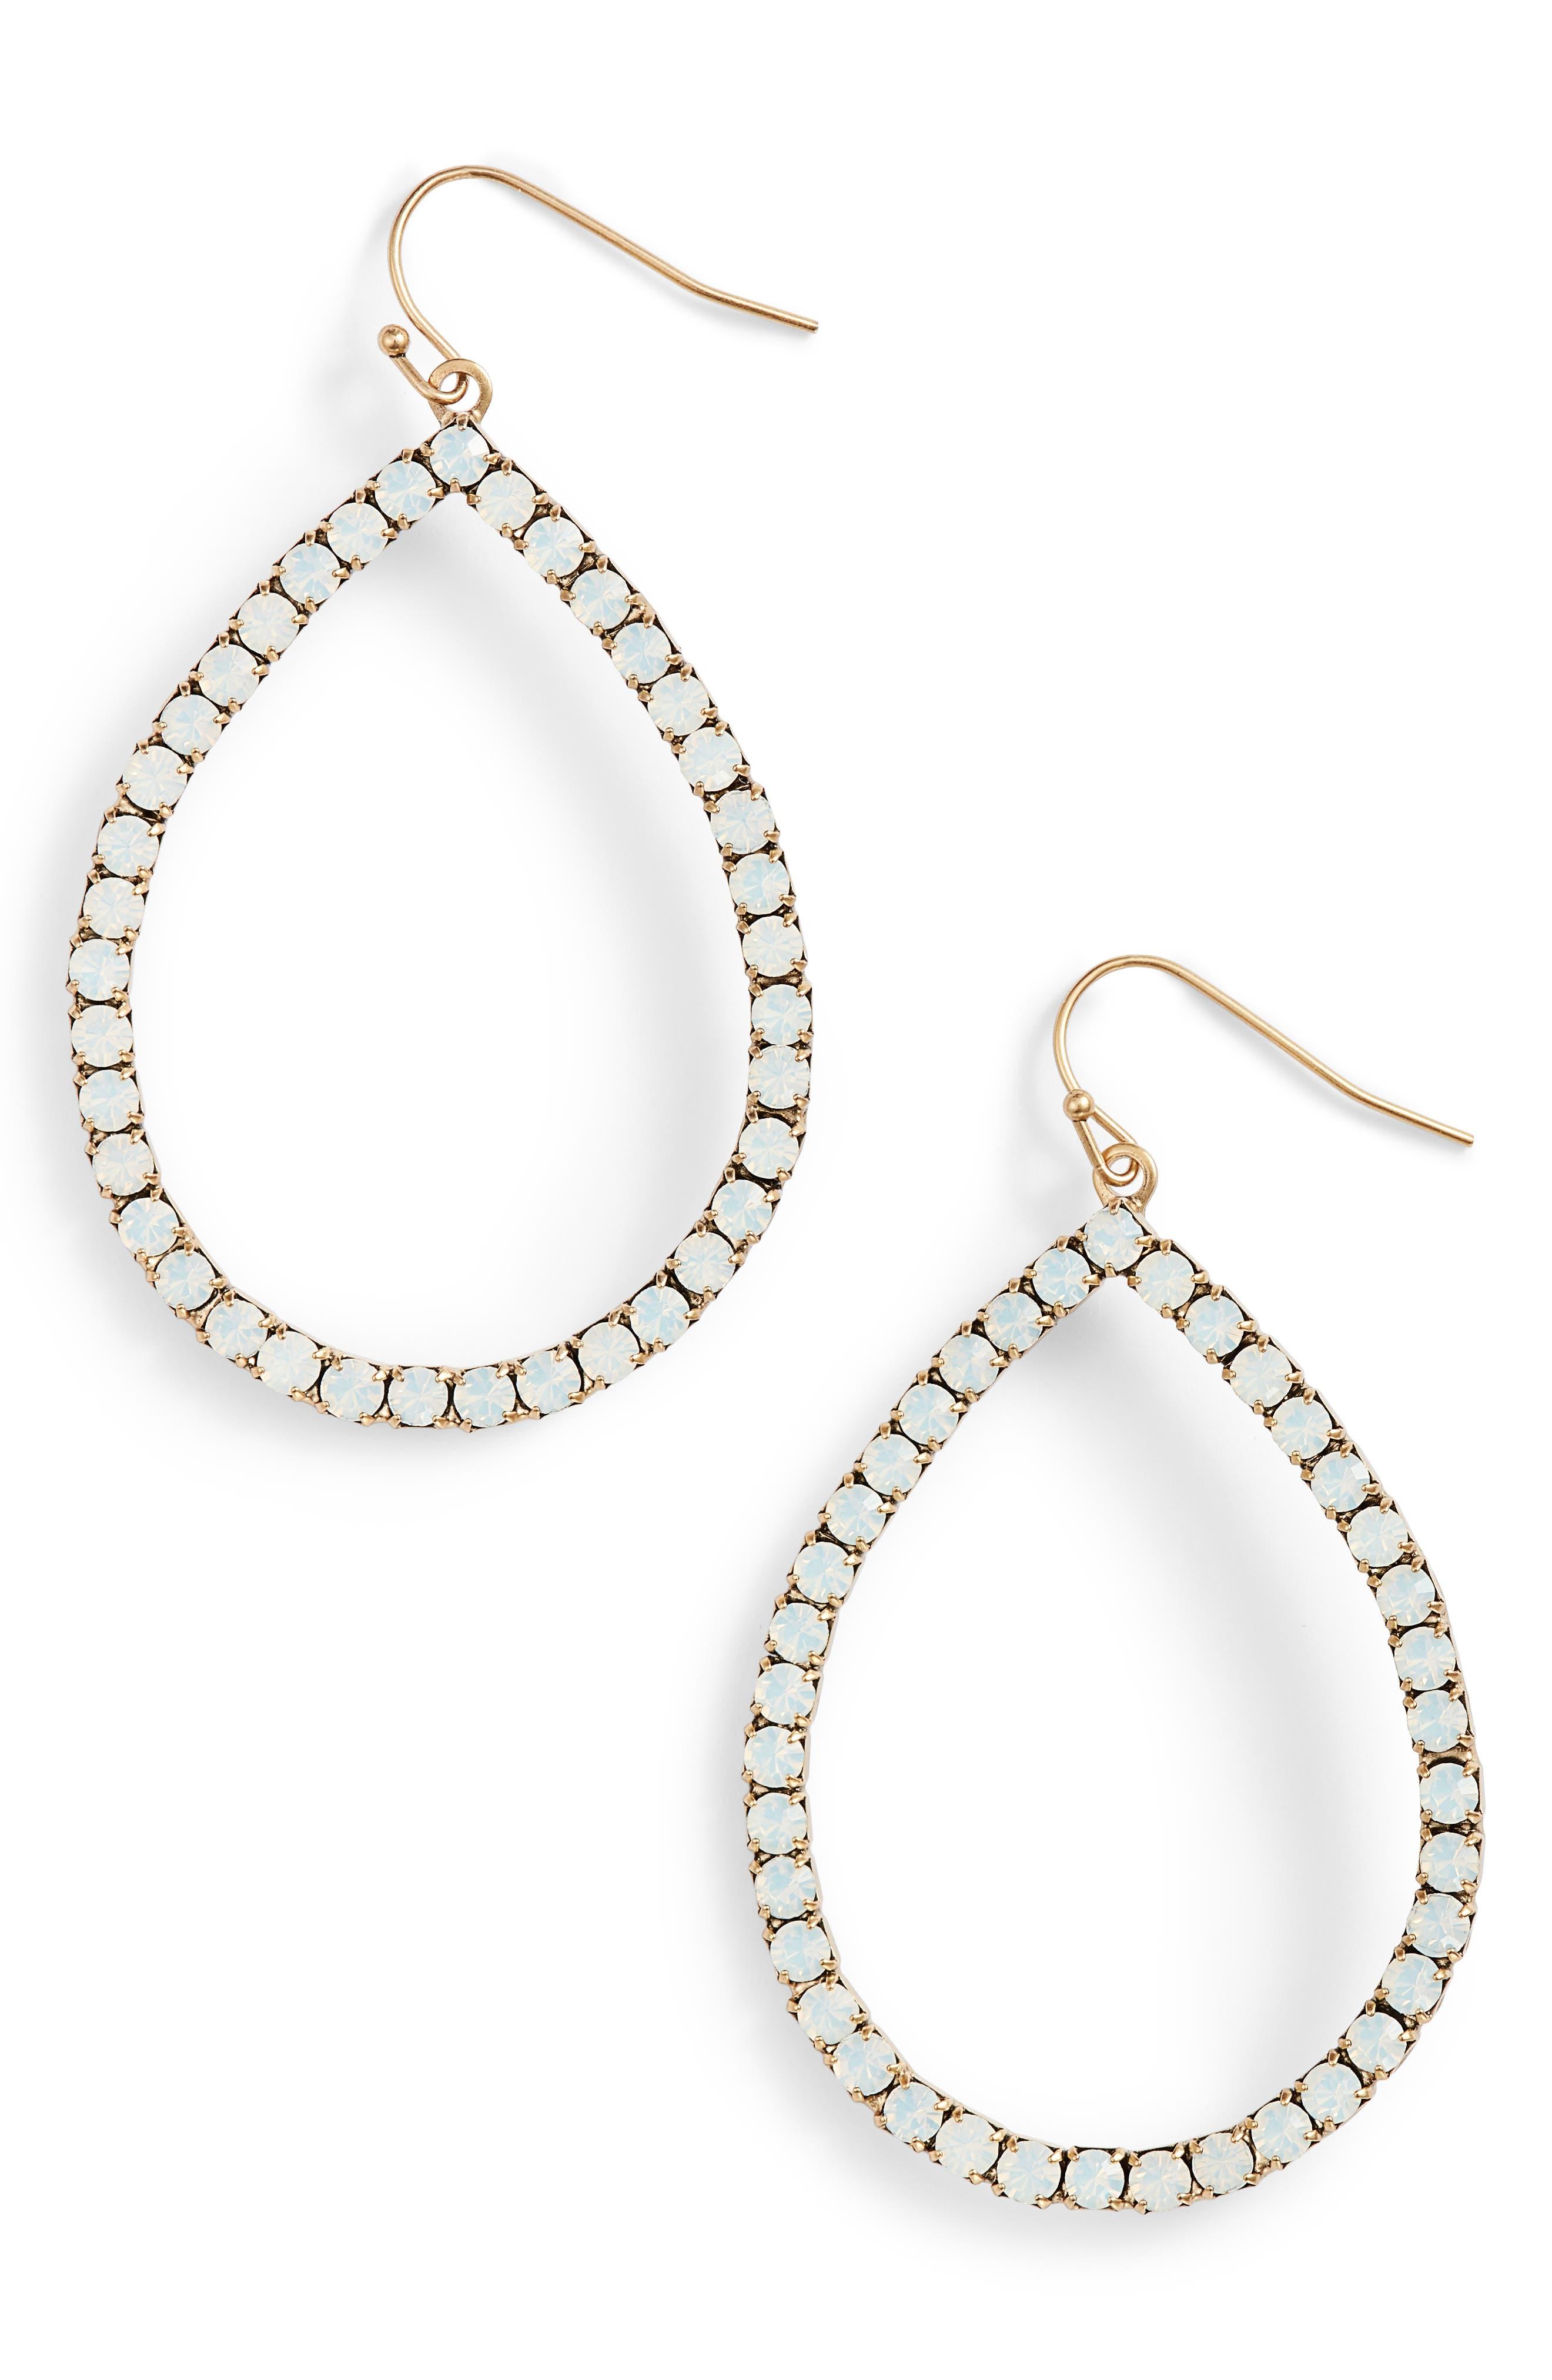 Emilia Crystal Teardrop Earrings,                         Main,                         color, White